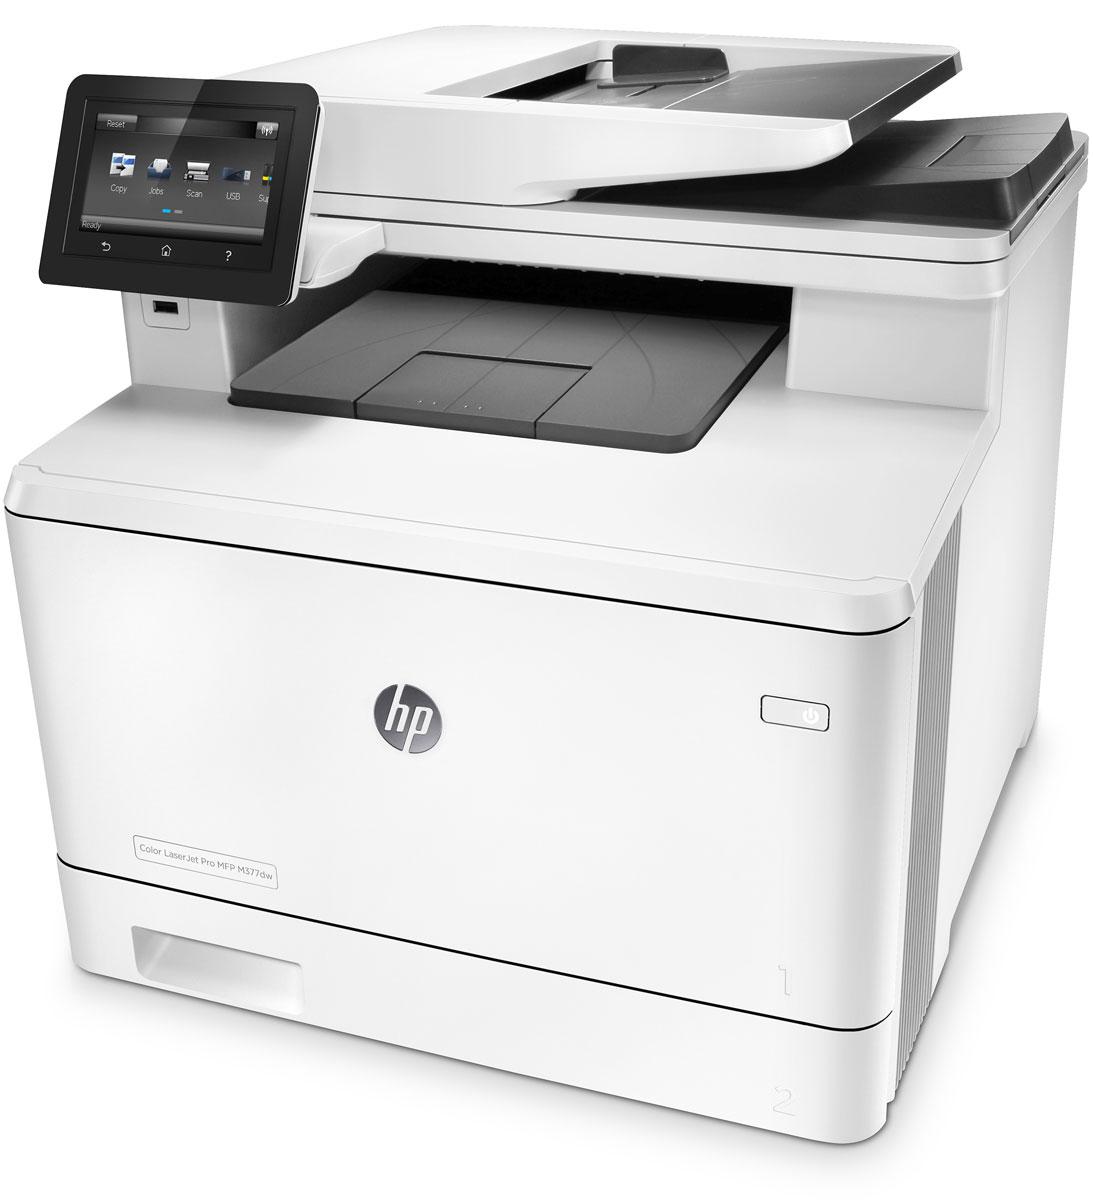 HP Color LaserJet Pro M377dw МФУ